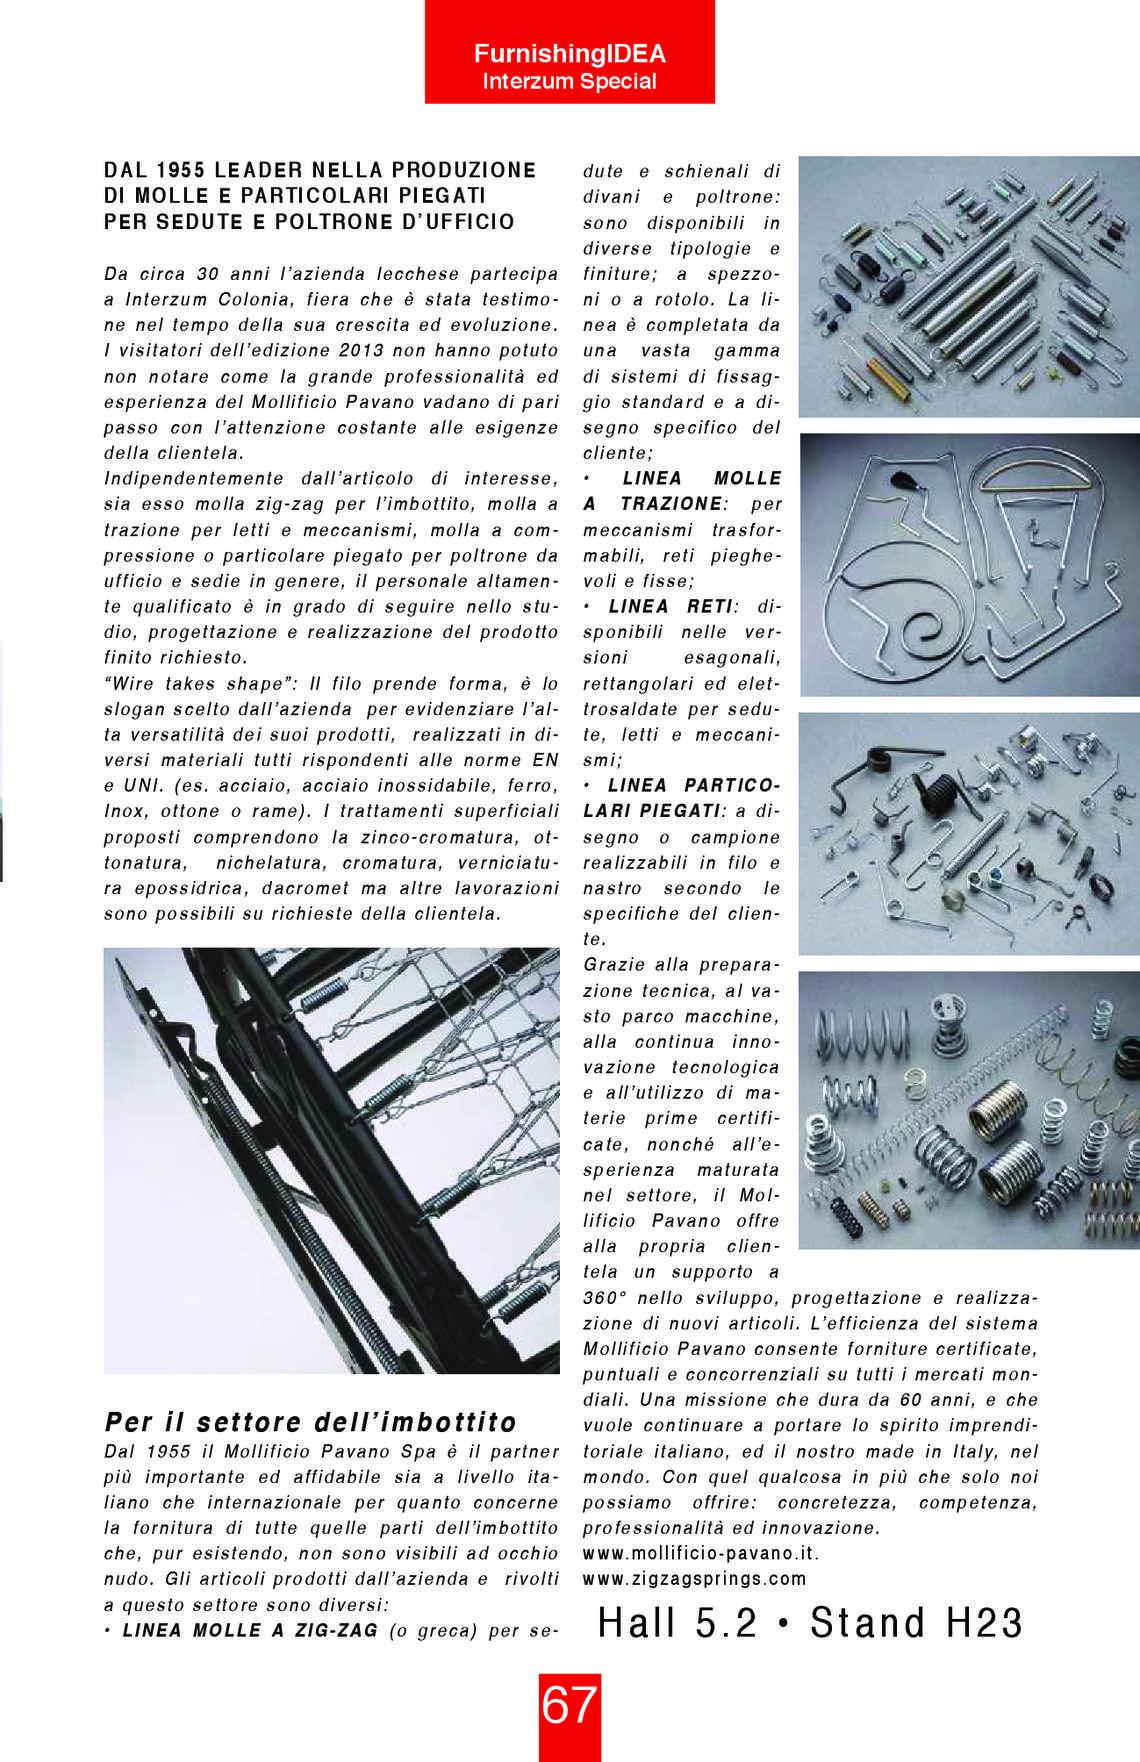 interzum-2015_journal_0_066.jpg